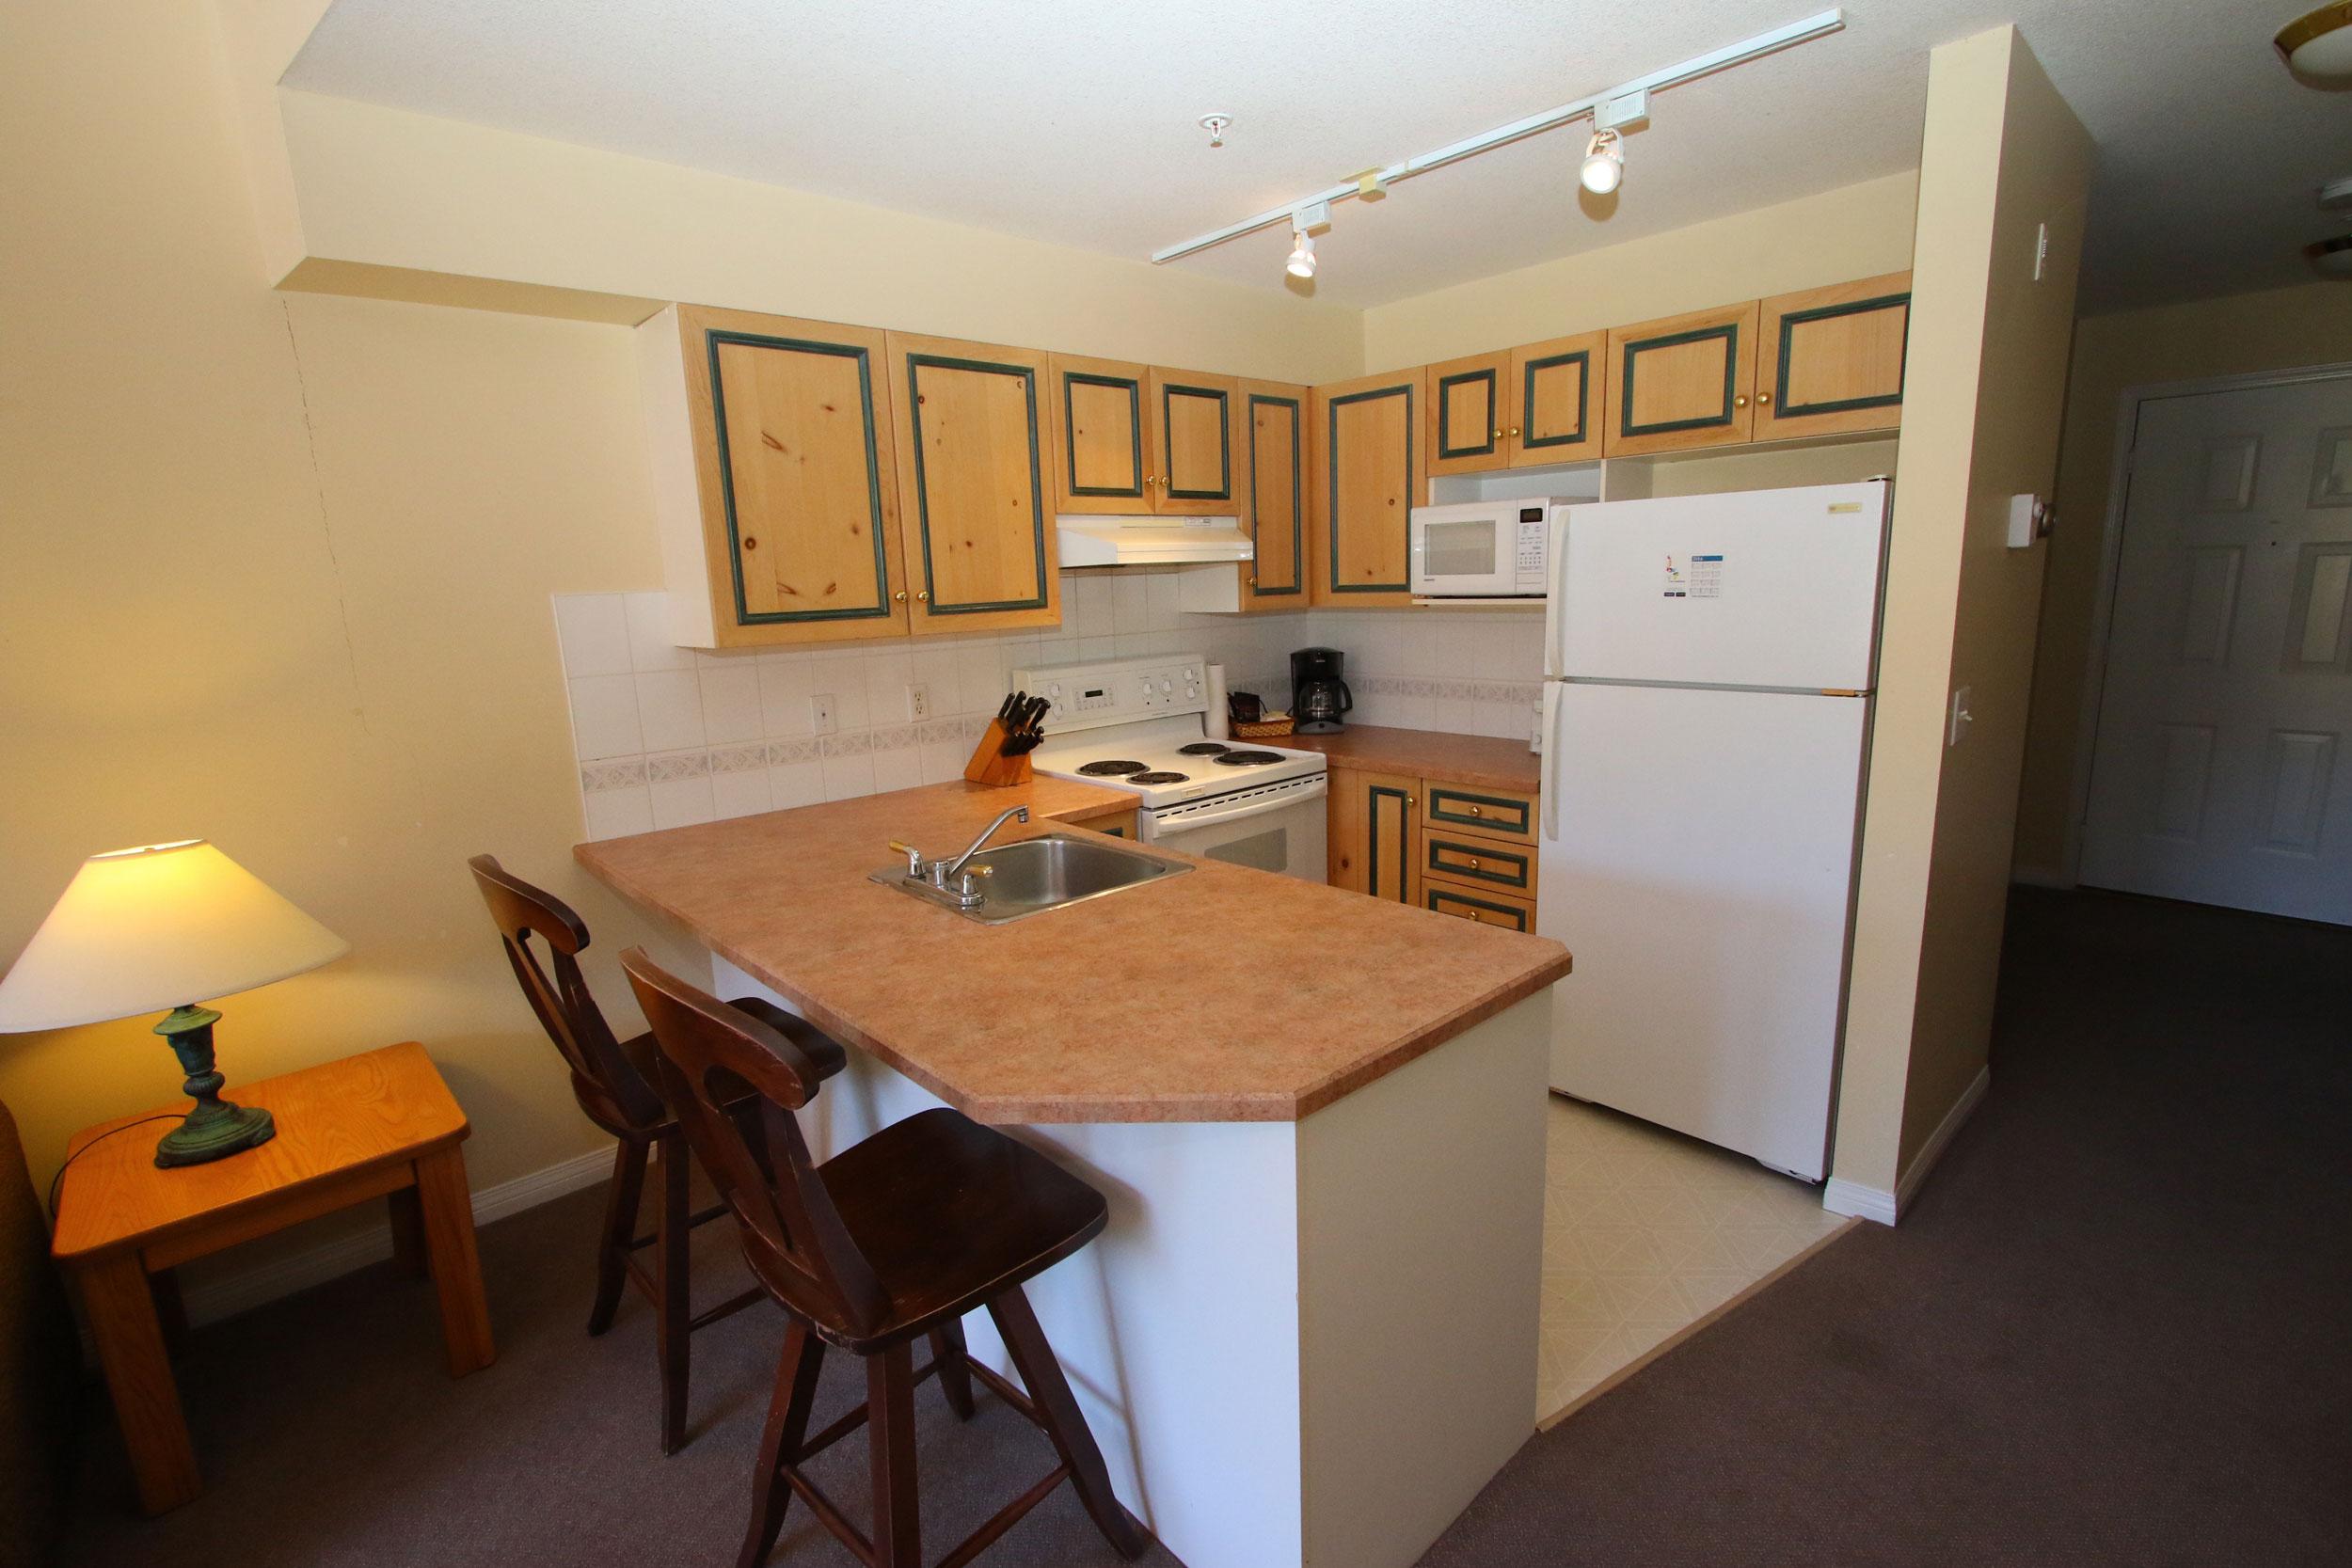 320 penthouse extended stays borgata lodge